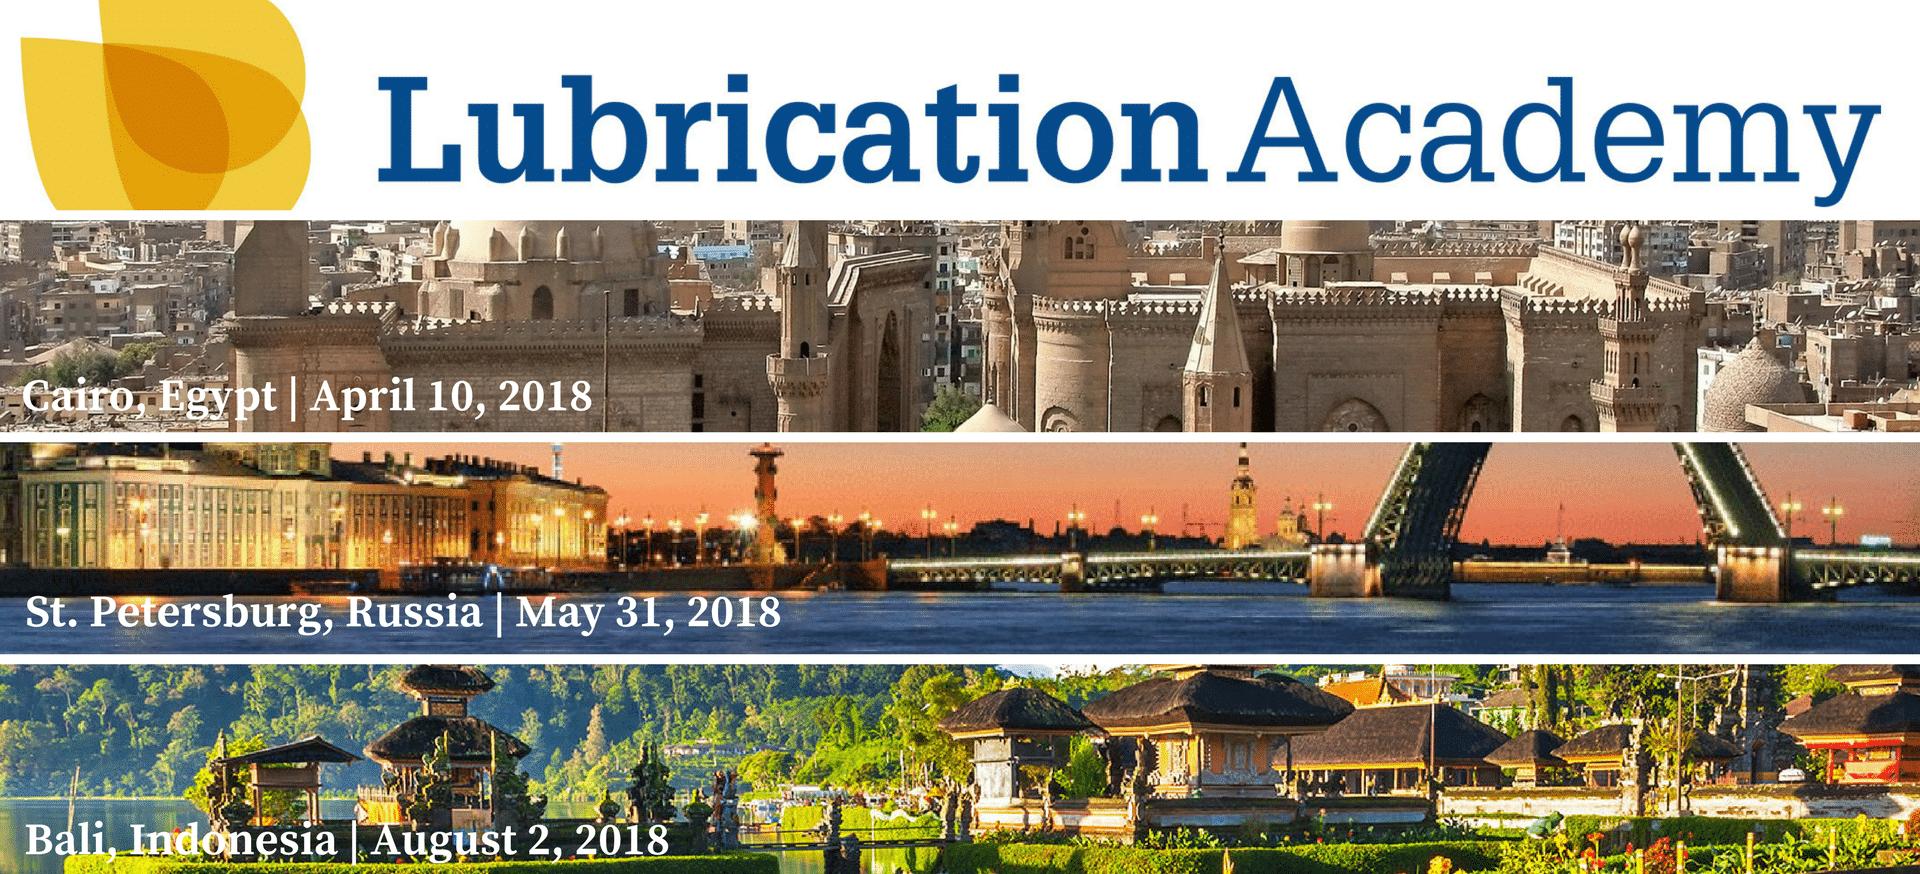 Lubrication Academy 2018 Dates